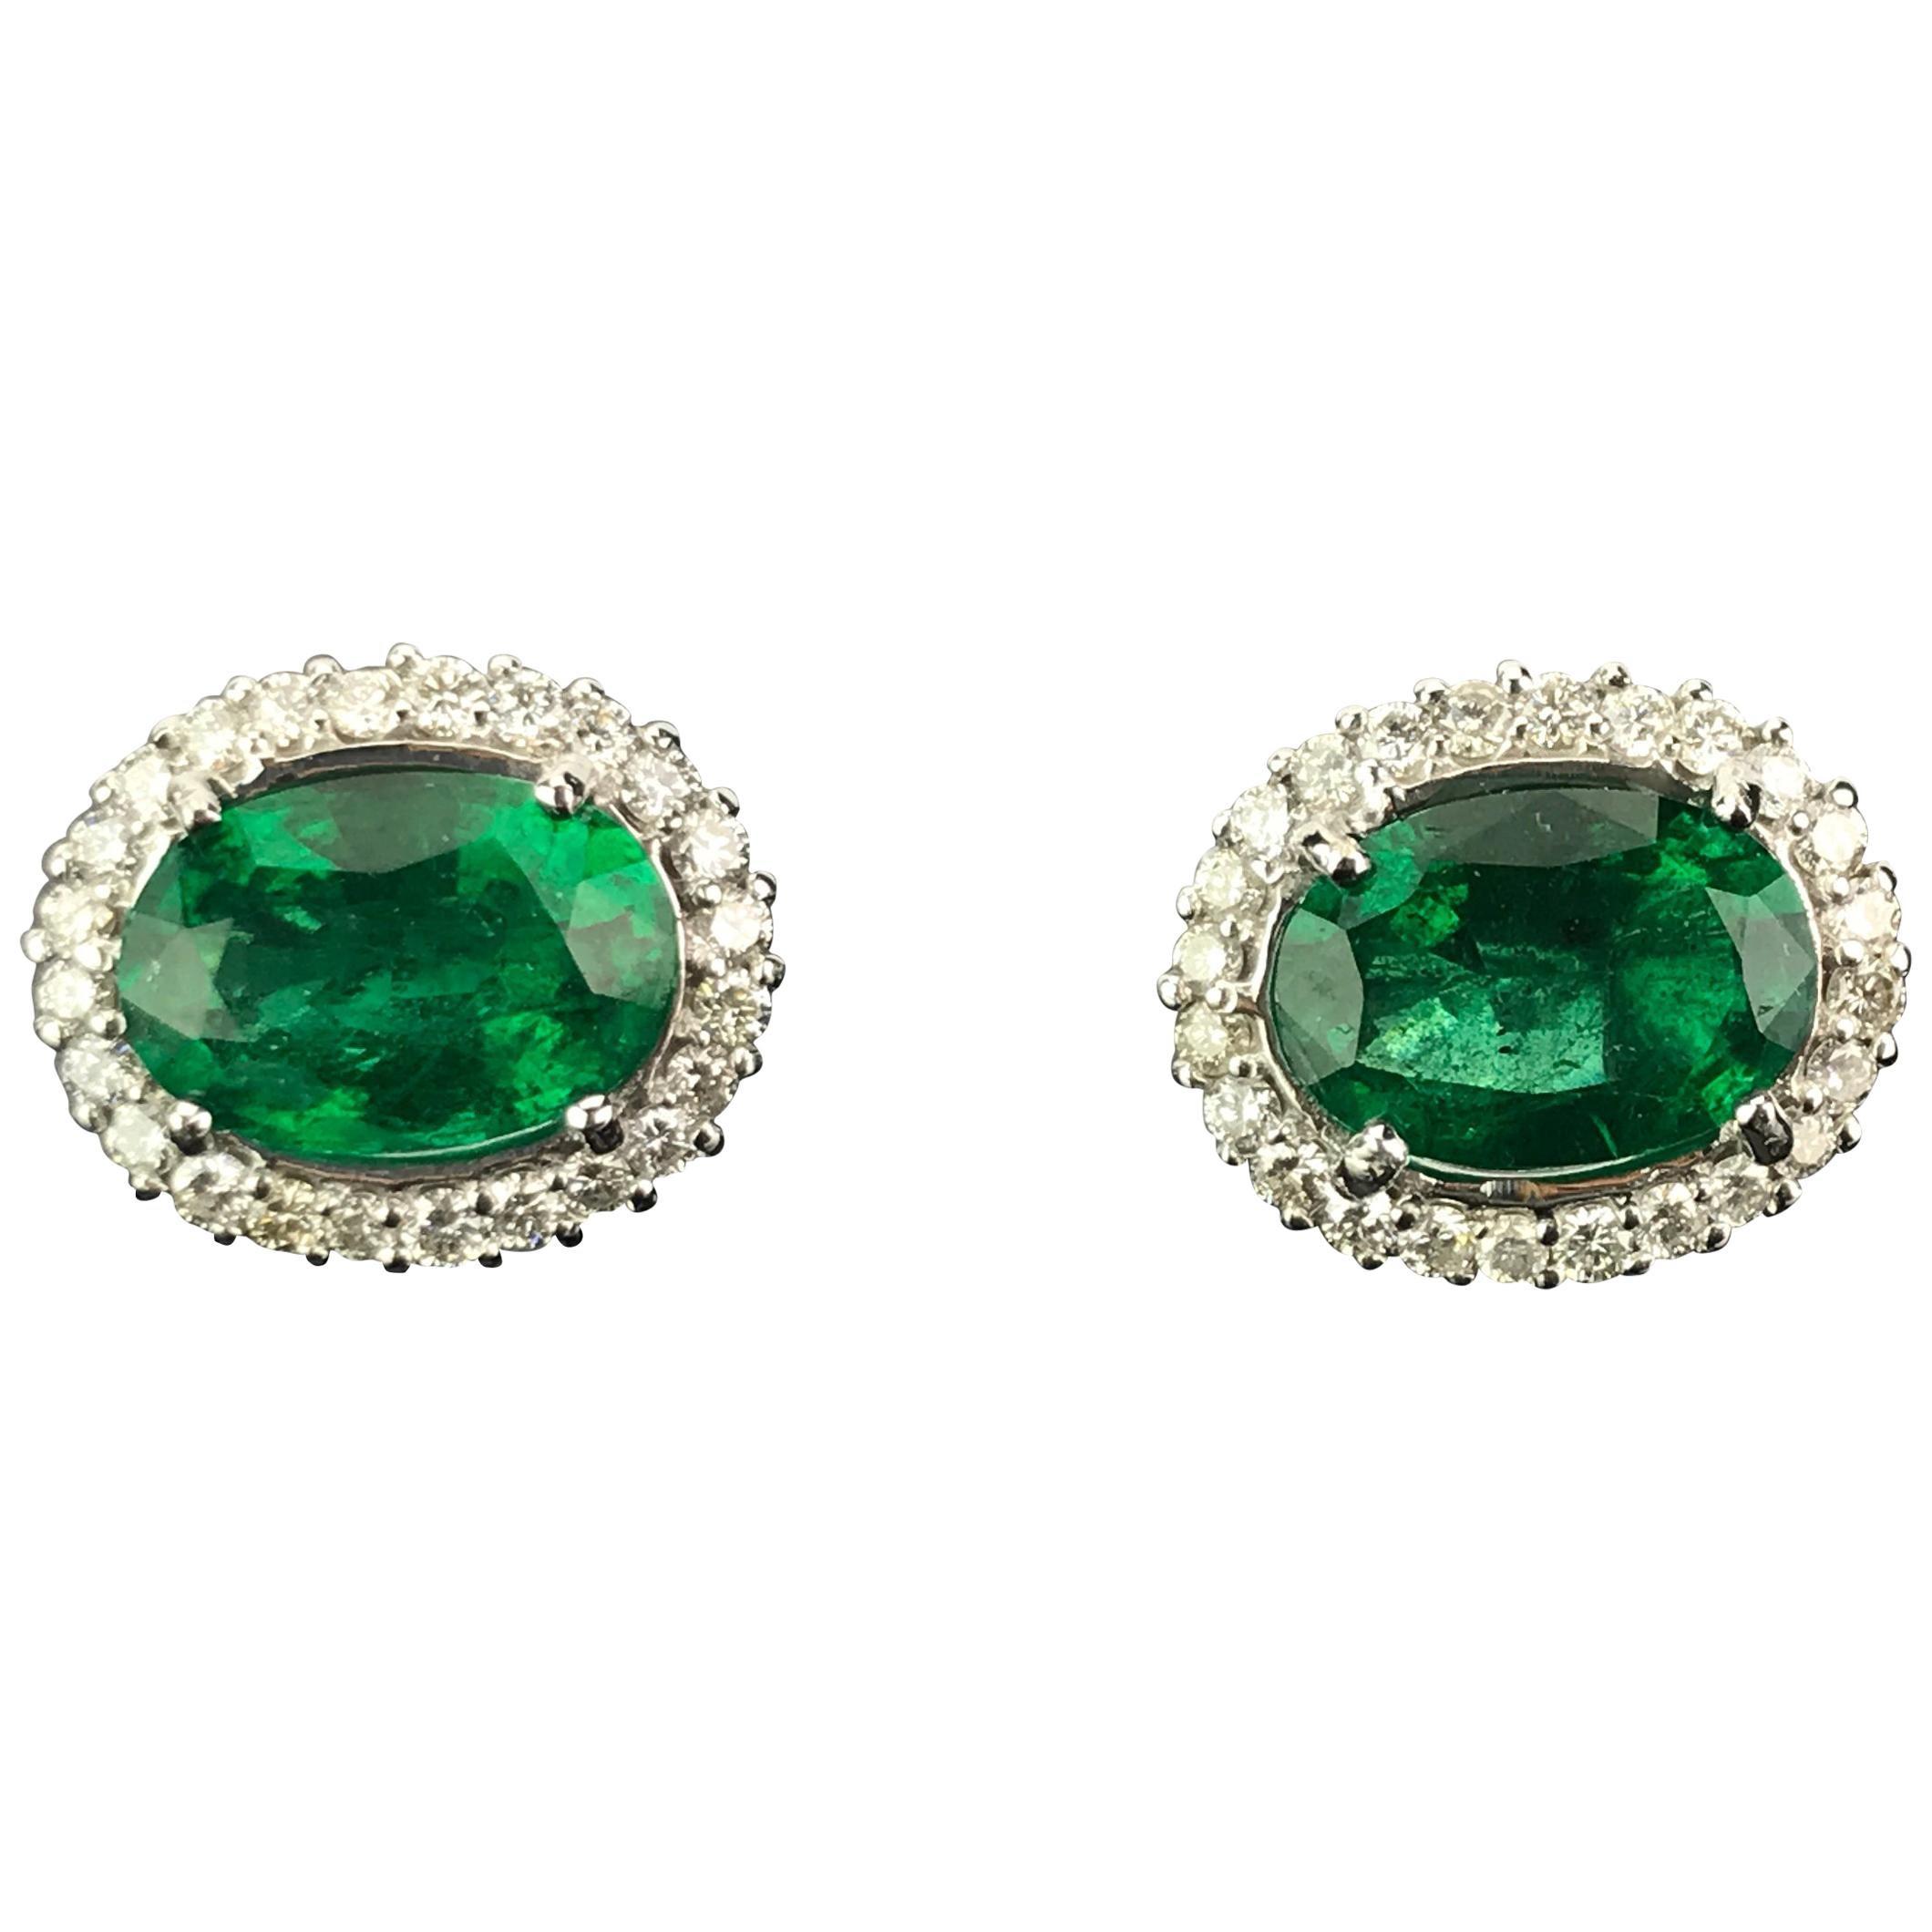 12.34 Carat Oval Emerald and Diamond 18 Karat Gold Stud Earrings